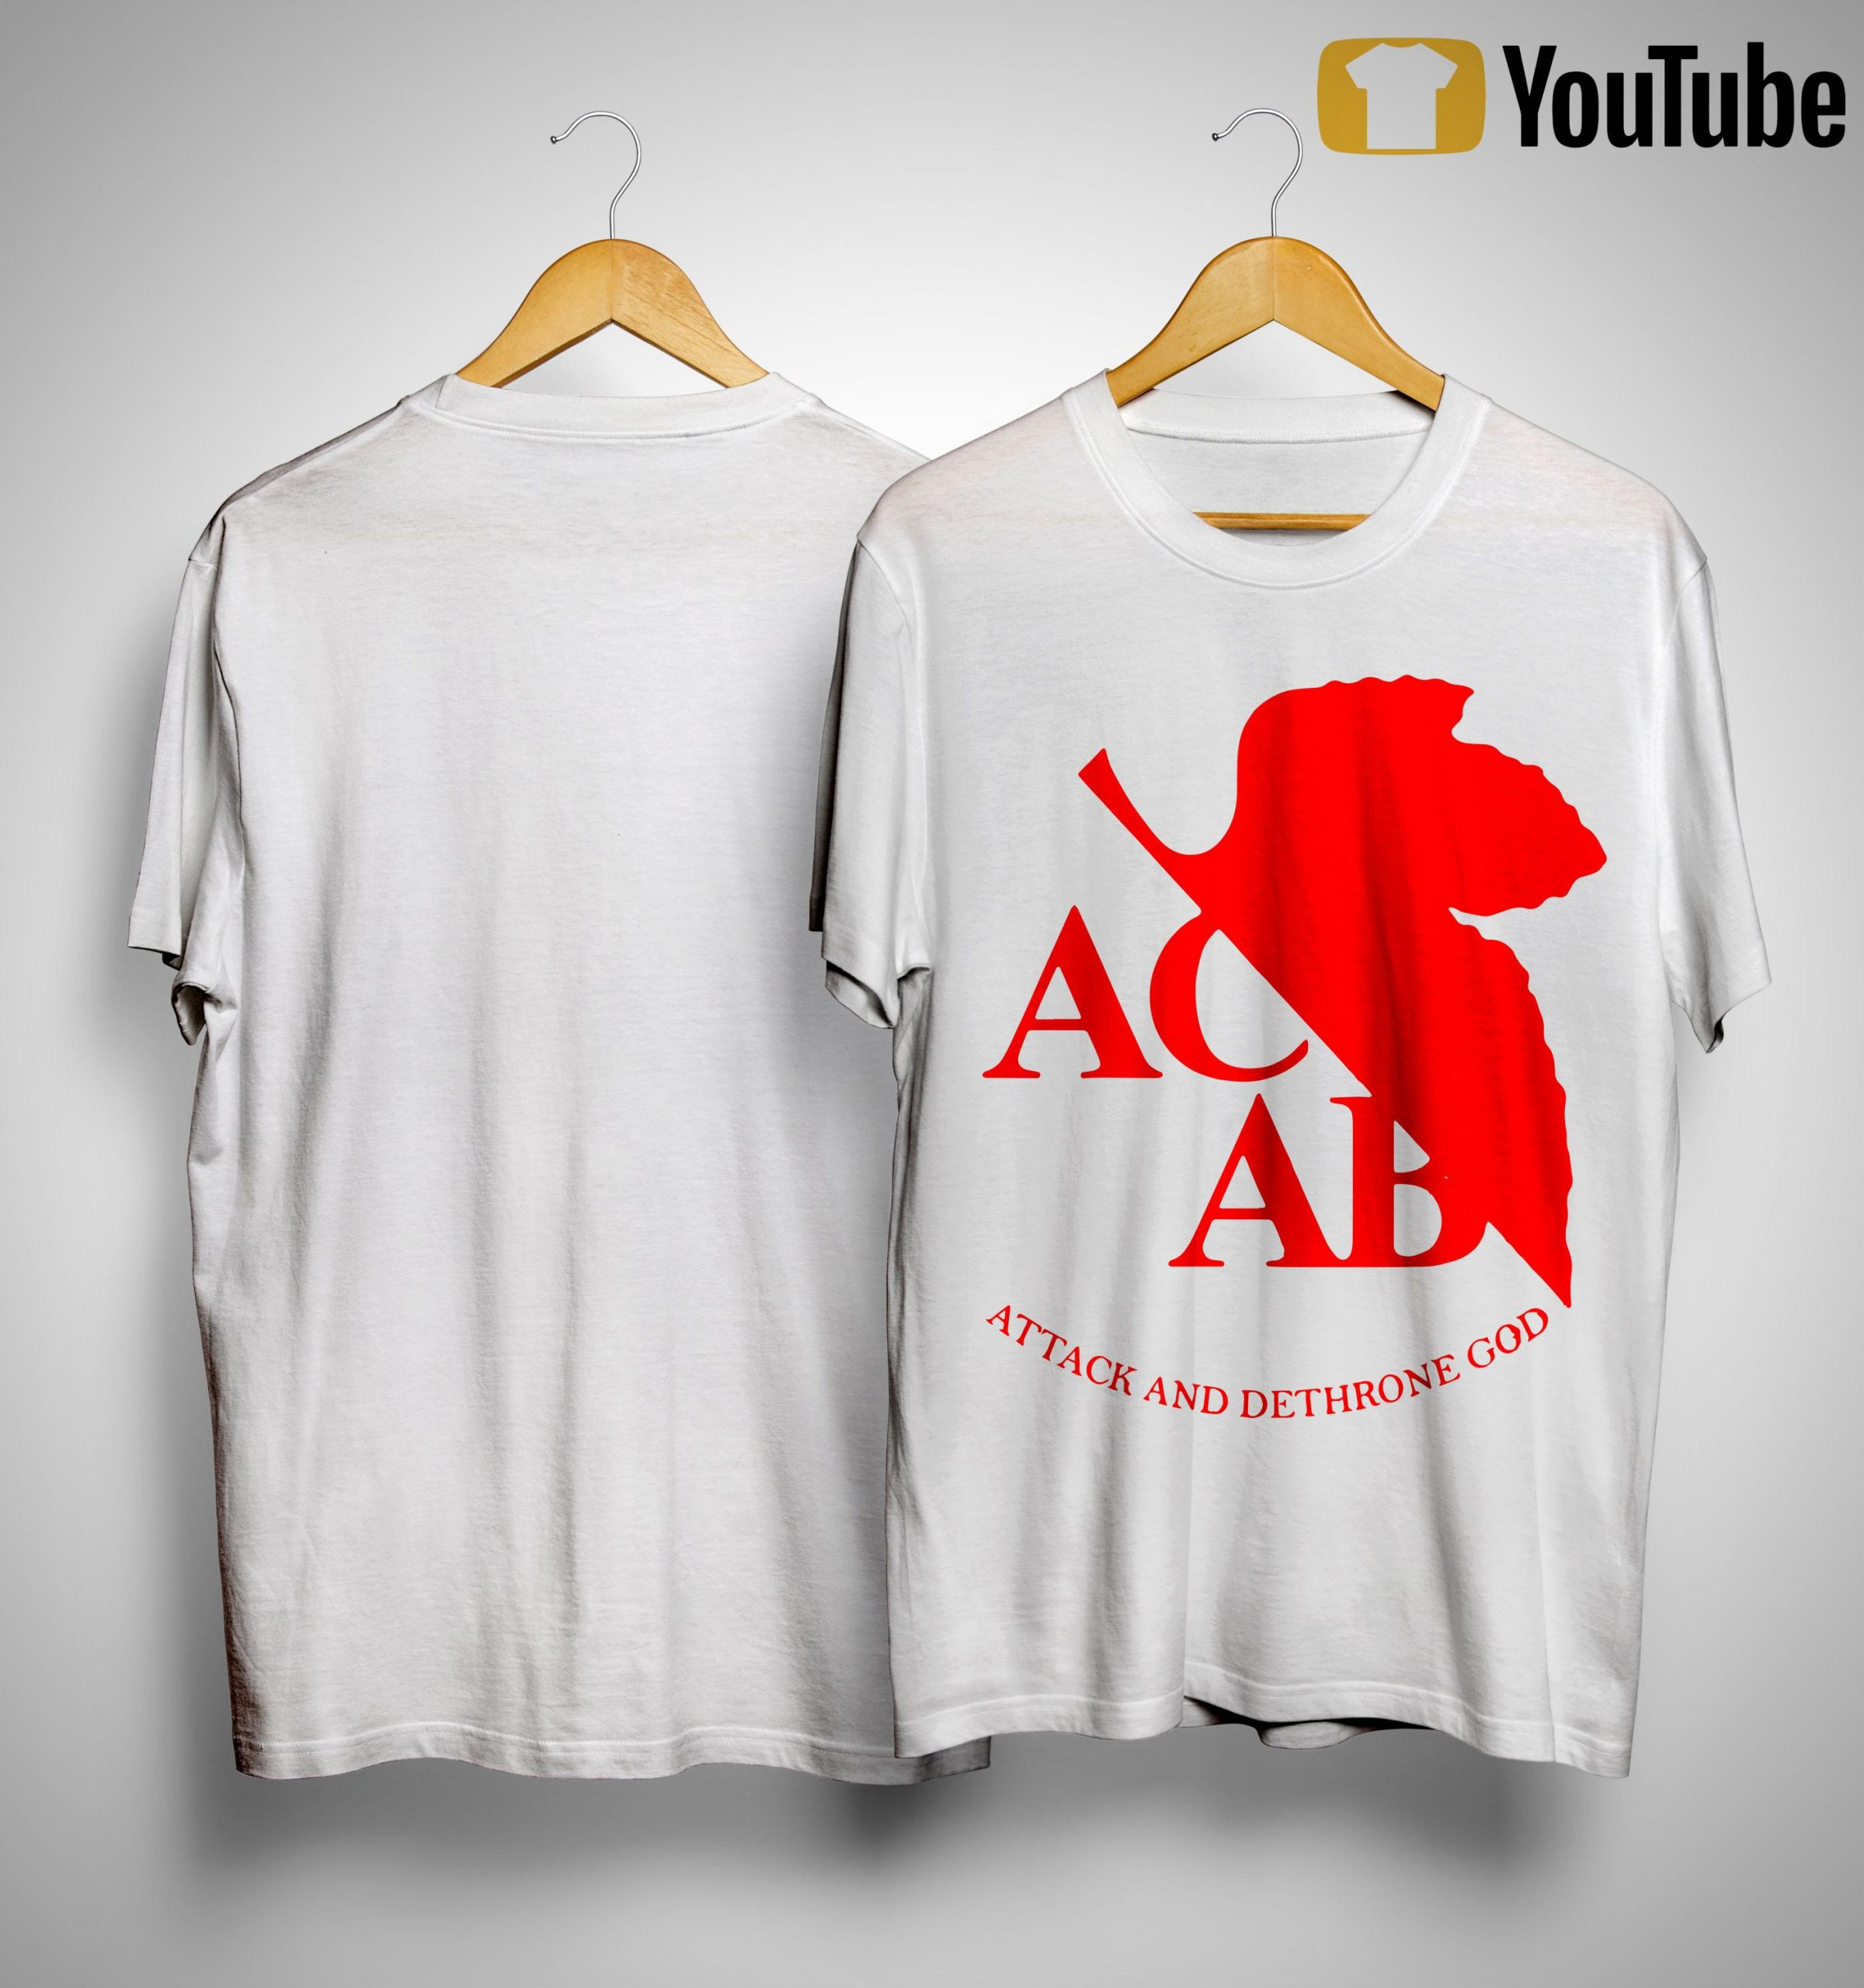 Acab Attack And Dethrone God Shirt